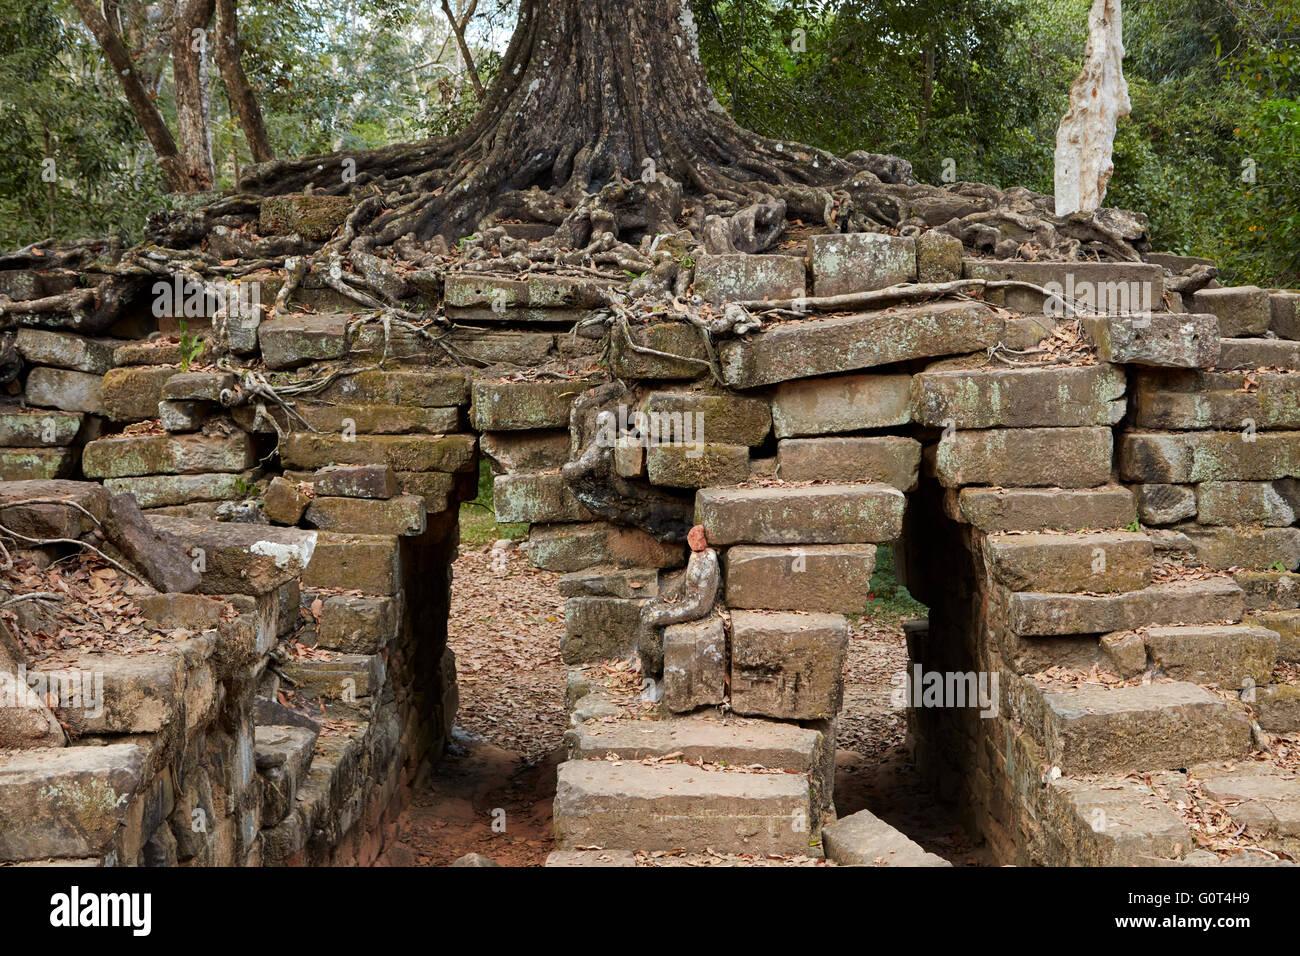 Tree growing on ruins of ancient Spean Thmor bridge, Angkor World Heritage Site, Siem Reap, Cambodia - Stock Image